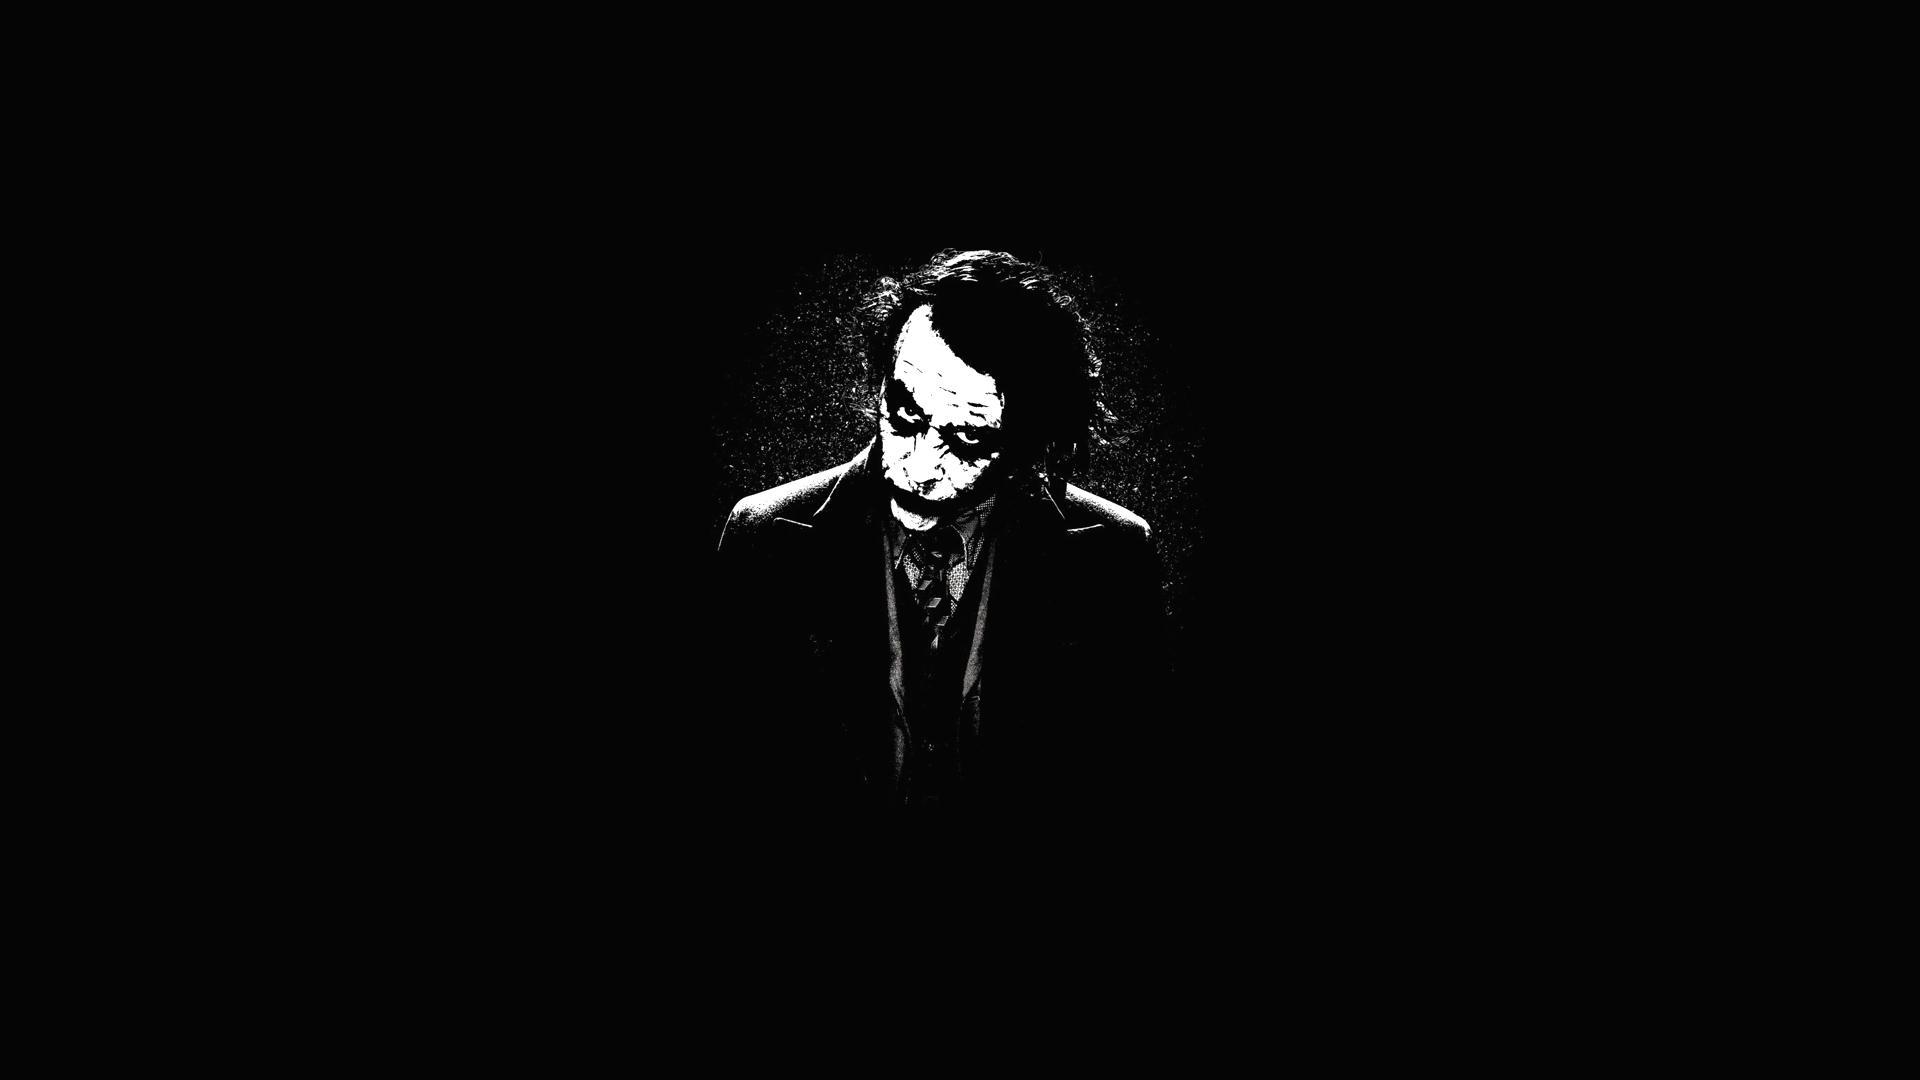 The dark knight Joker Batman Anime Dark HD Wallpapers, Desktop